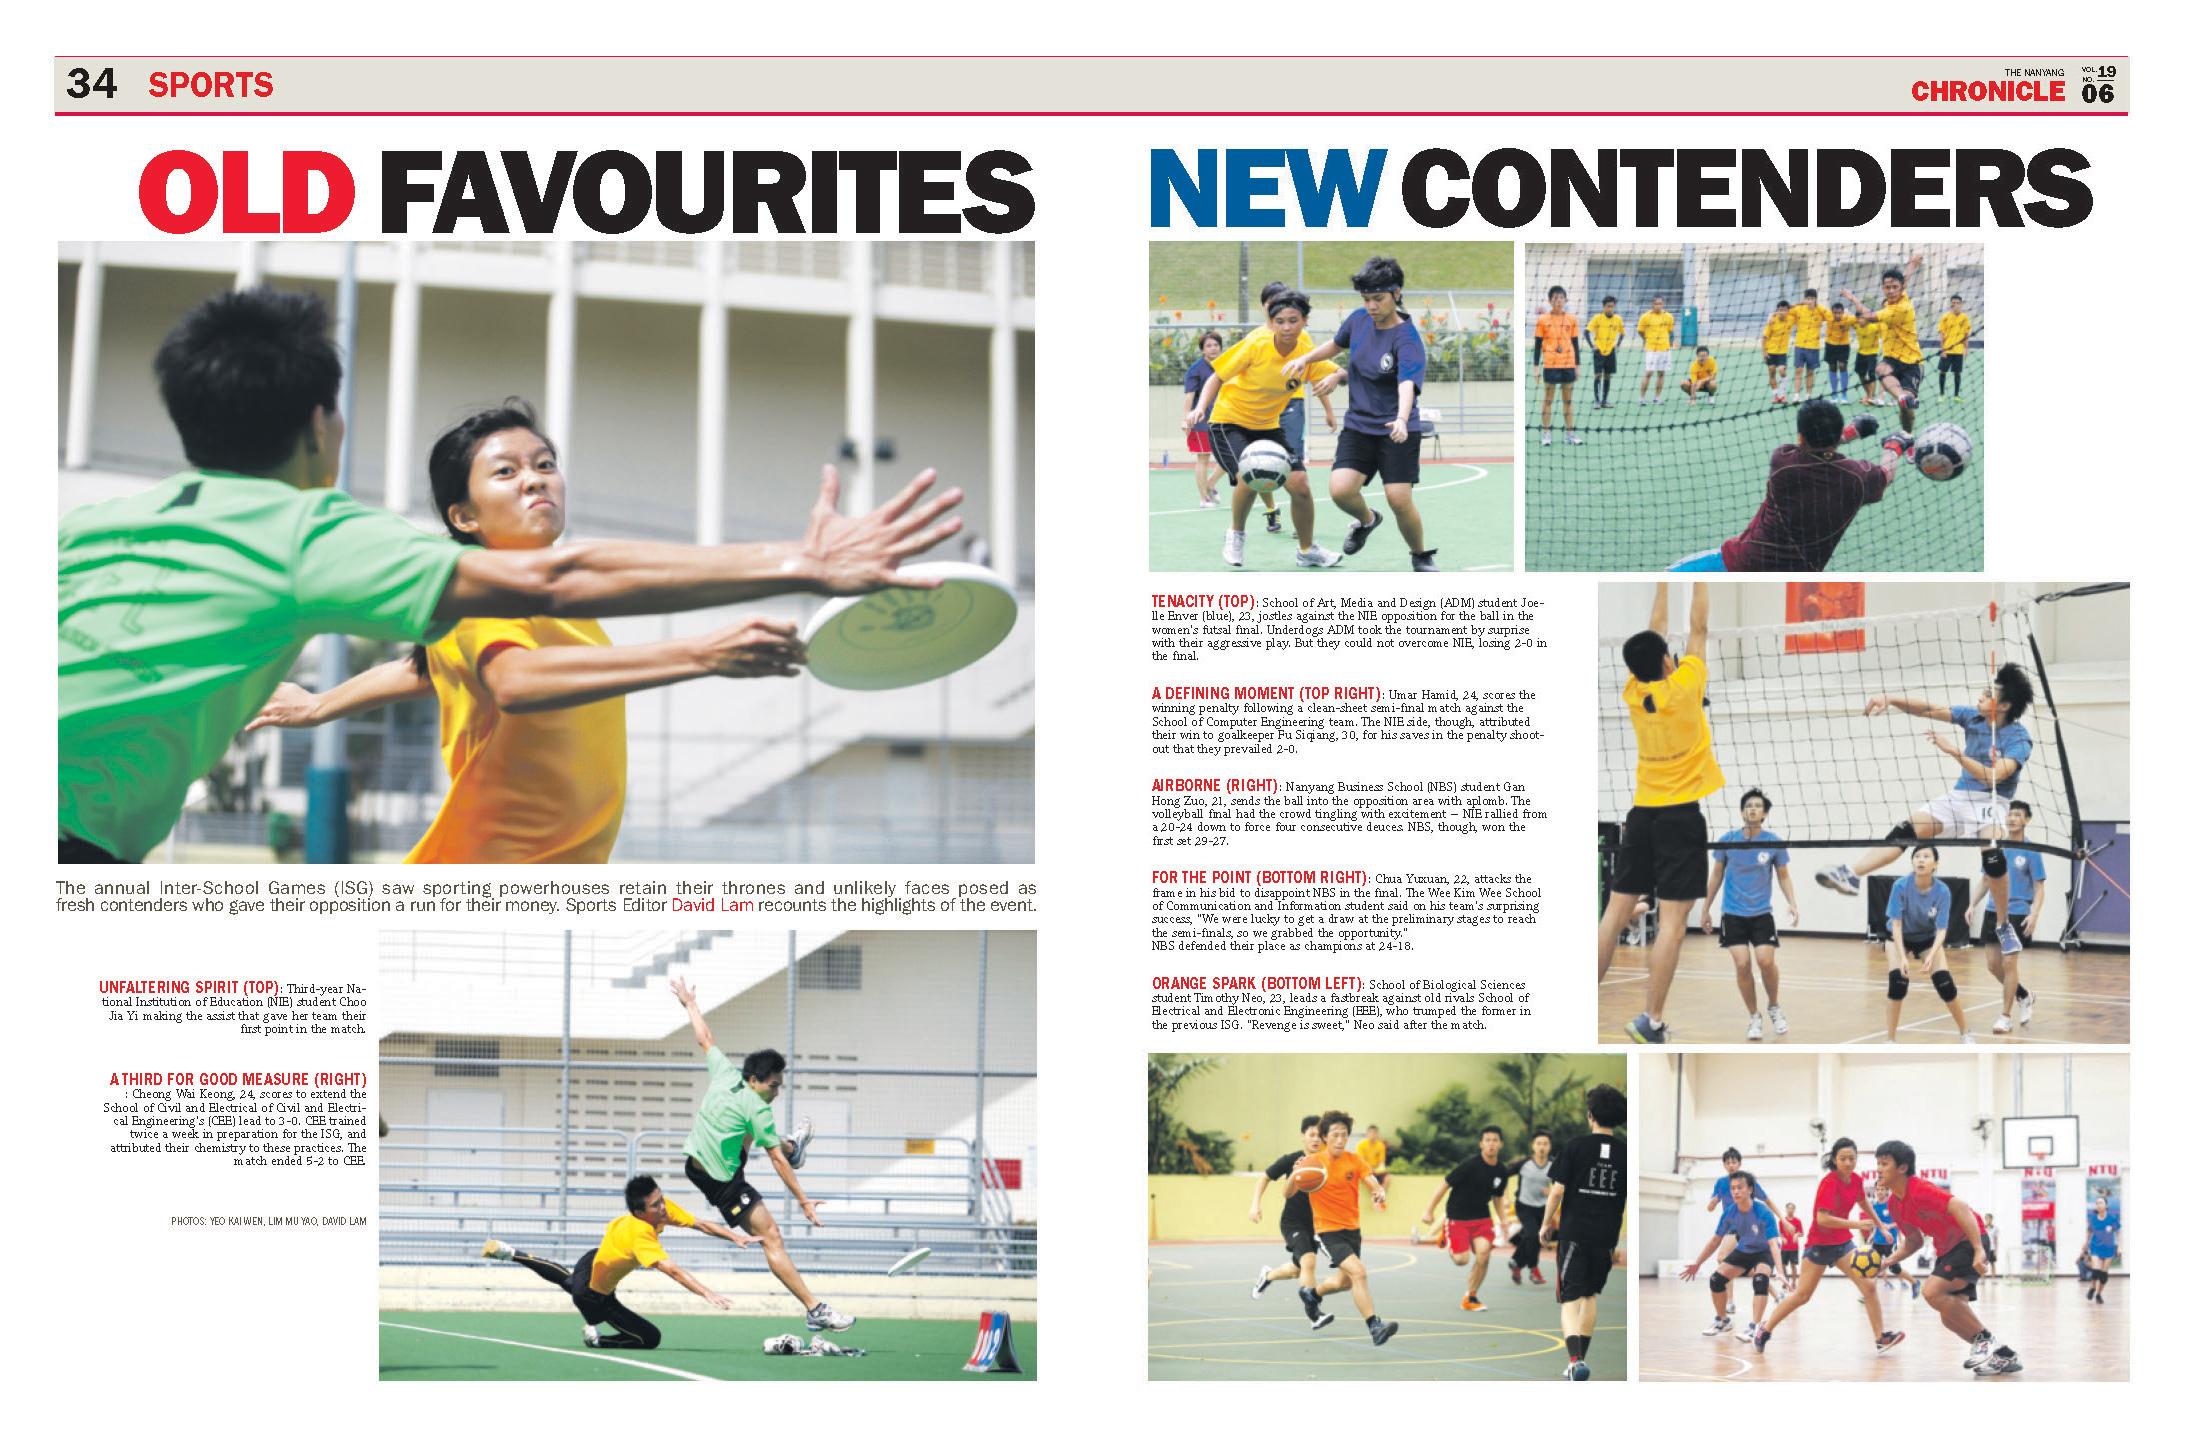 Sports Photo Essay